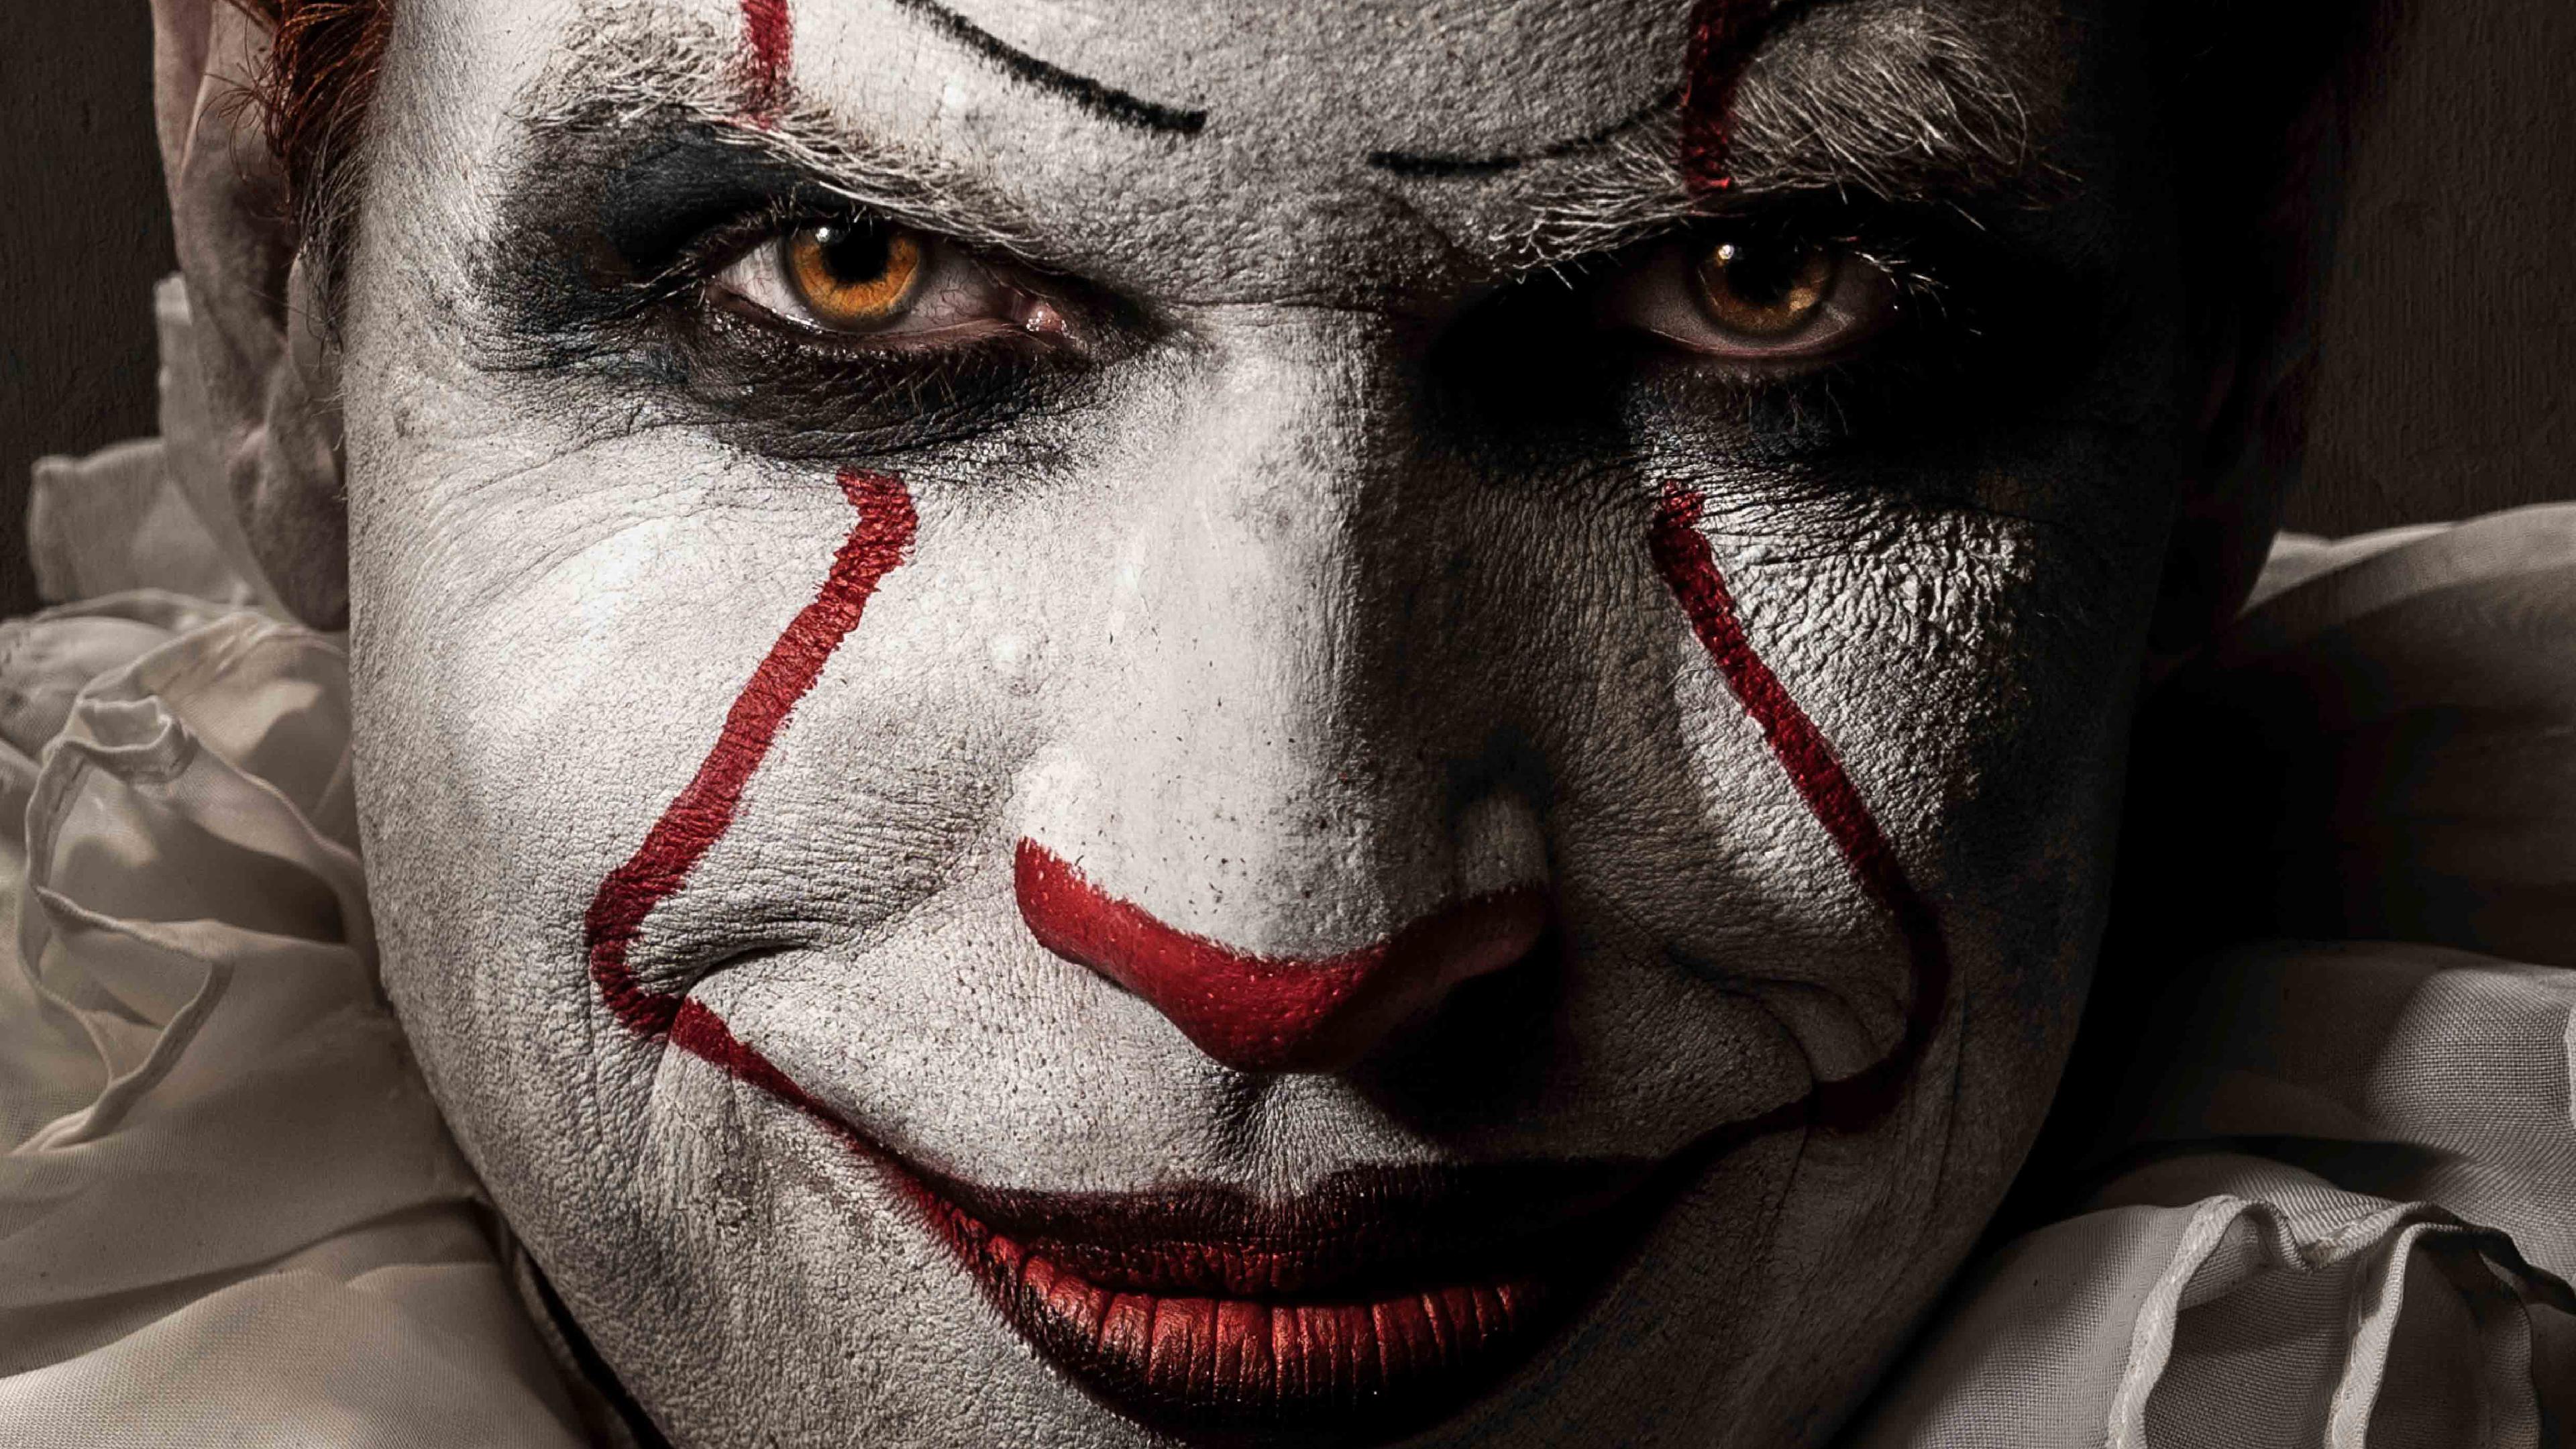 pennywise joker 4k 1543105210 - Pennywise Joker 4k - pennywise wallpapers, movies wallpapers, joker wallpapers, it wallpapers, hd-wallpapers, clown wallpapers, 5k wallpapers, 4k-wallpapers, 2017 movies wallpapers